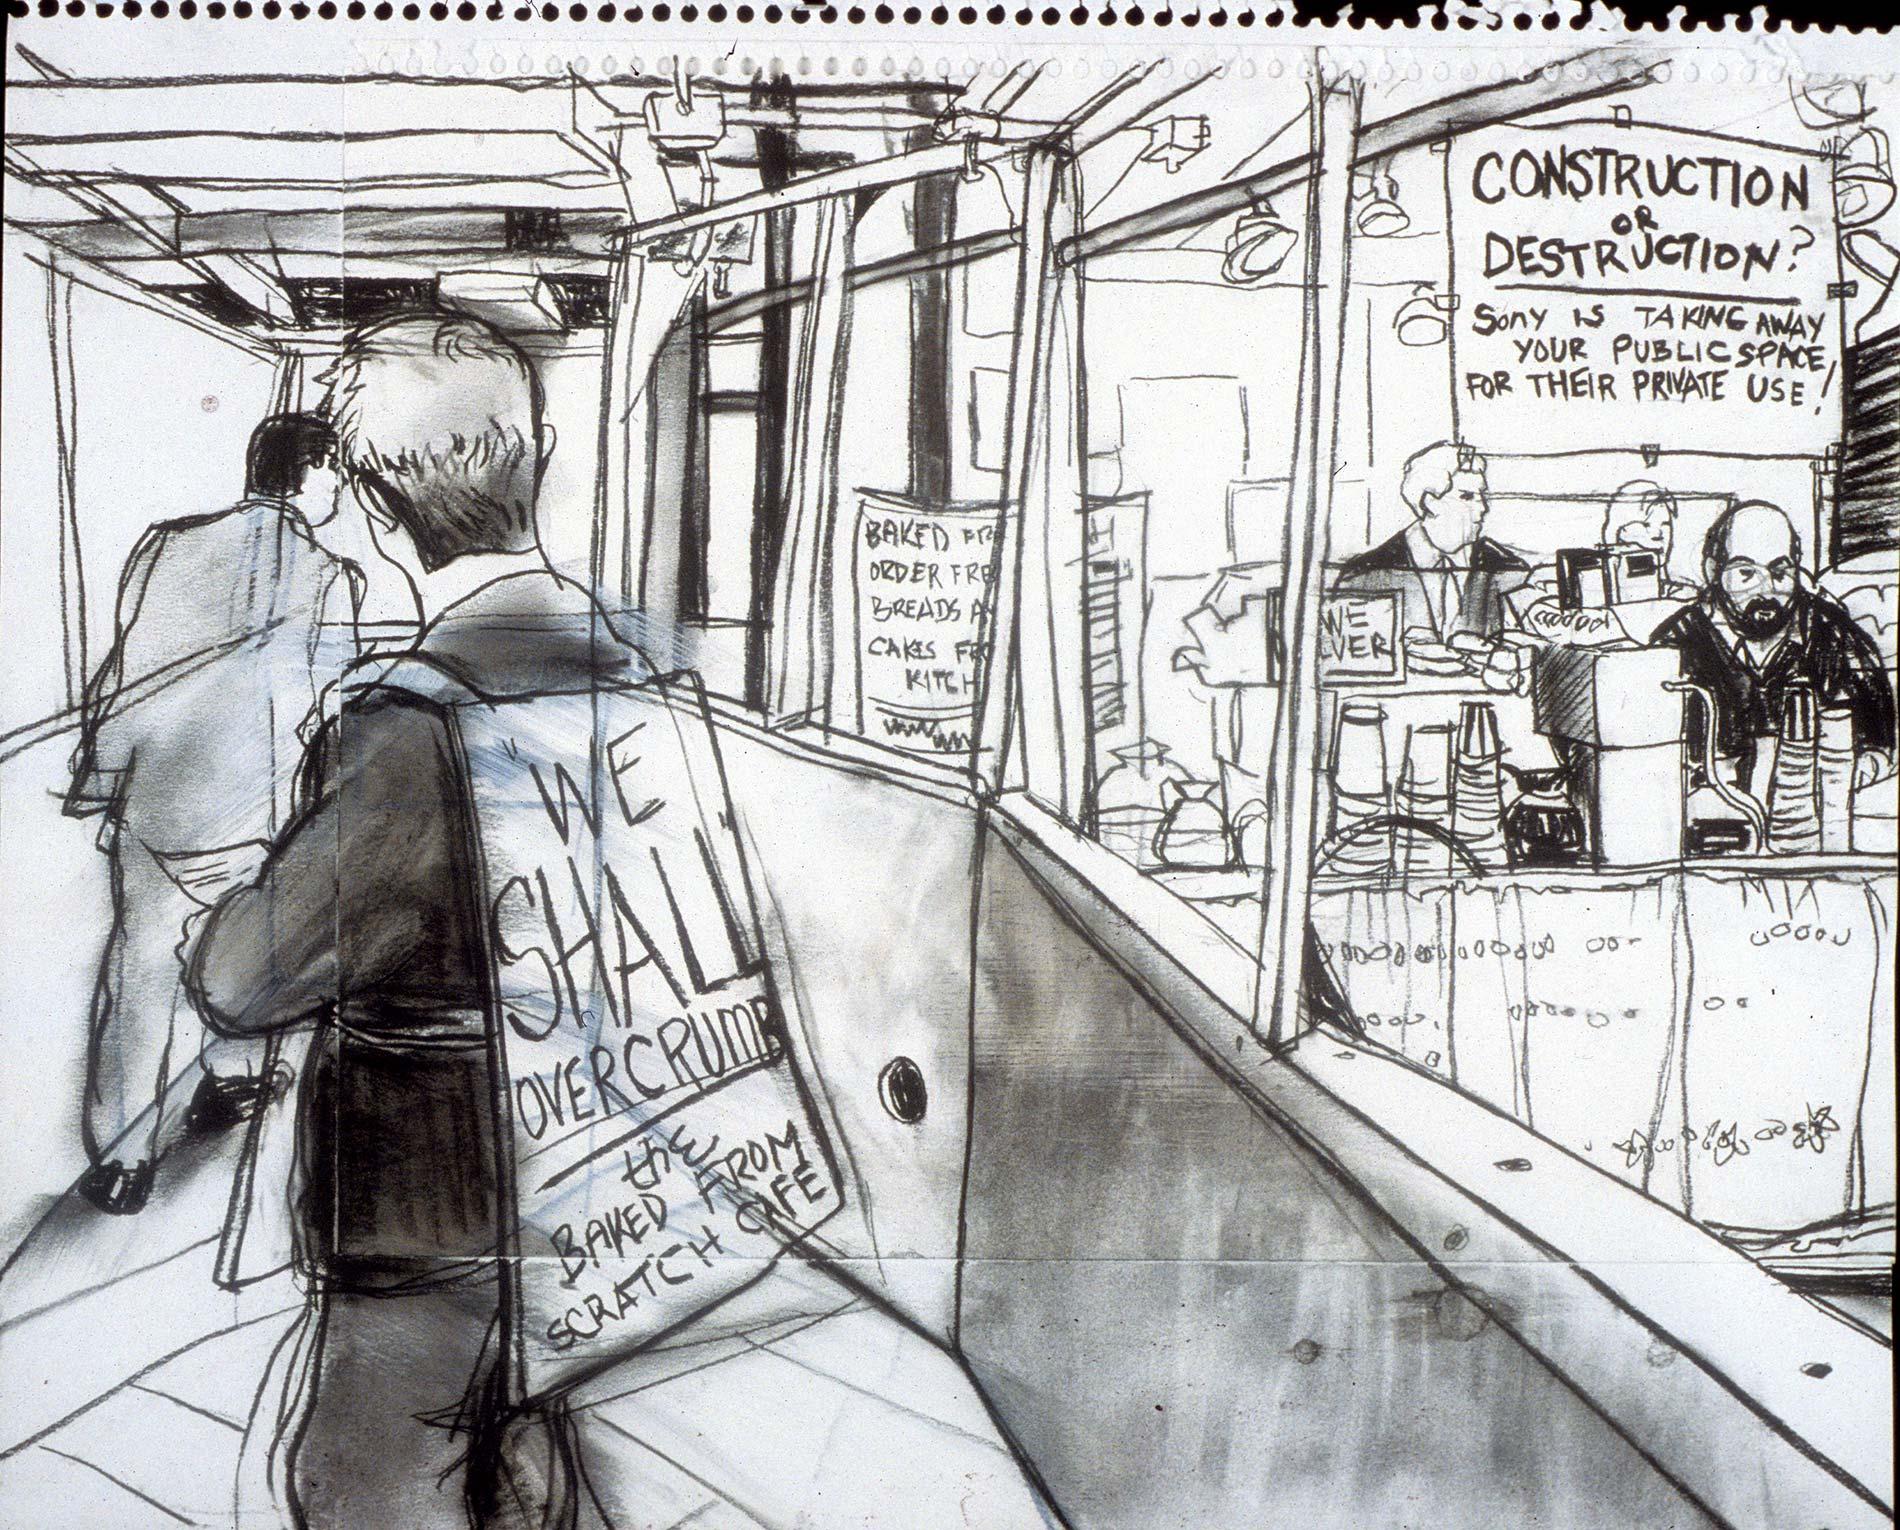 NYT-picketing-bakery.jpg